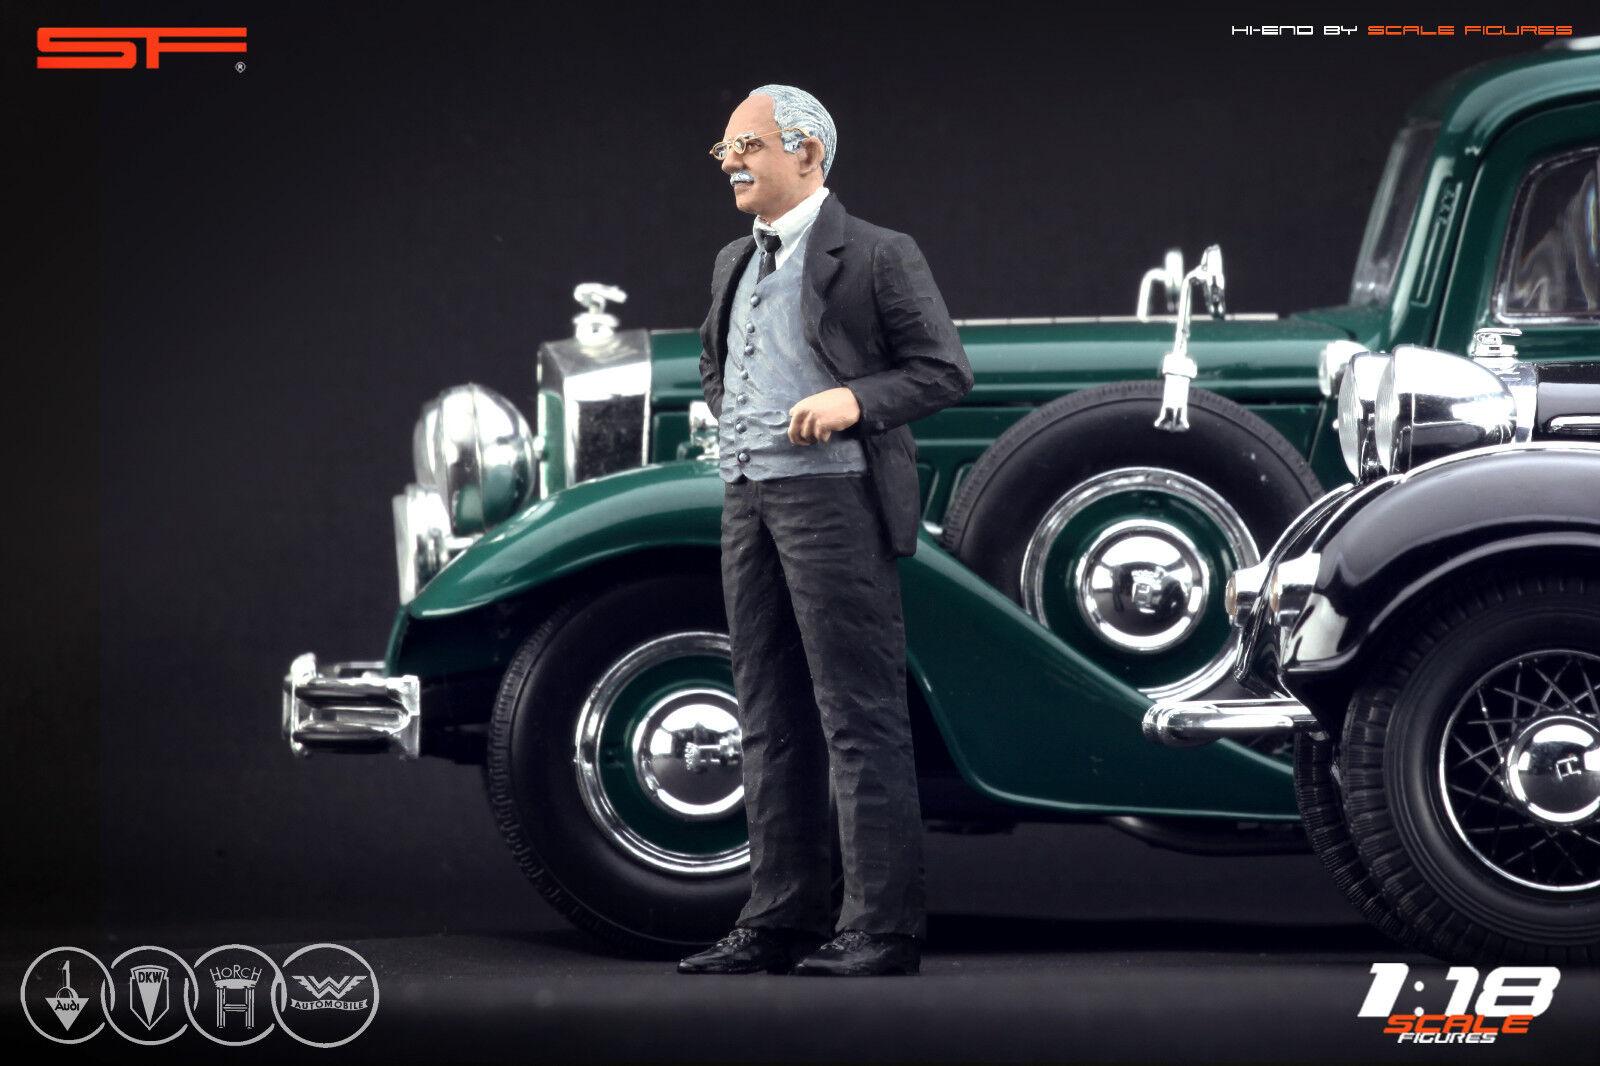 de agosto Horch (Audi fundador) Muy Raro Pintado, sin auto